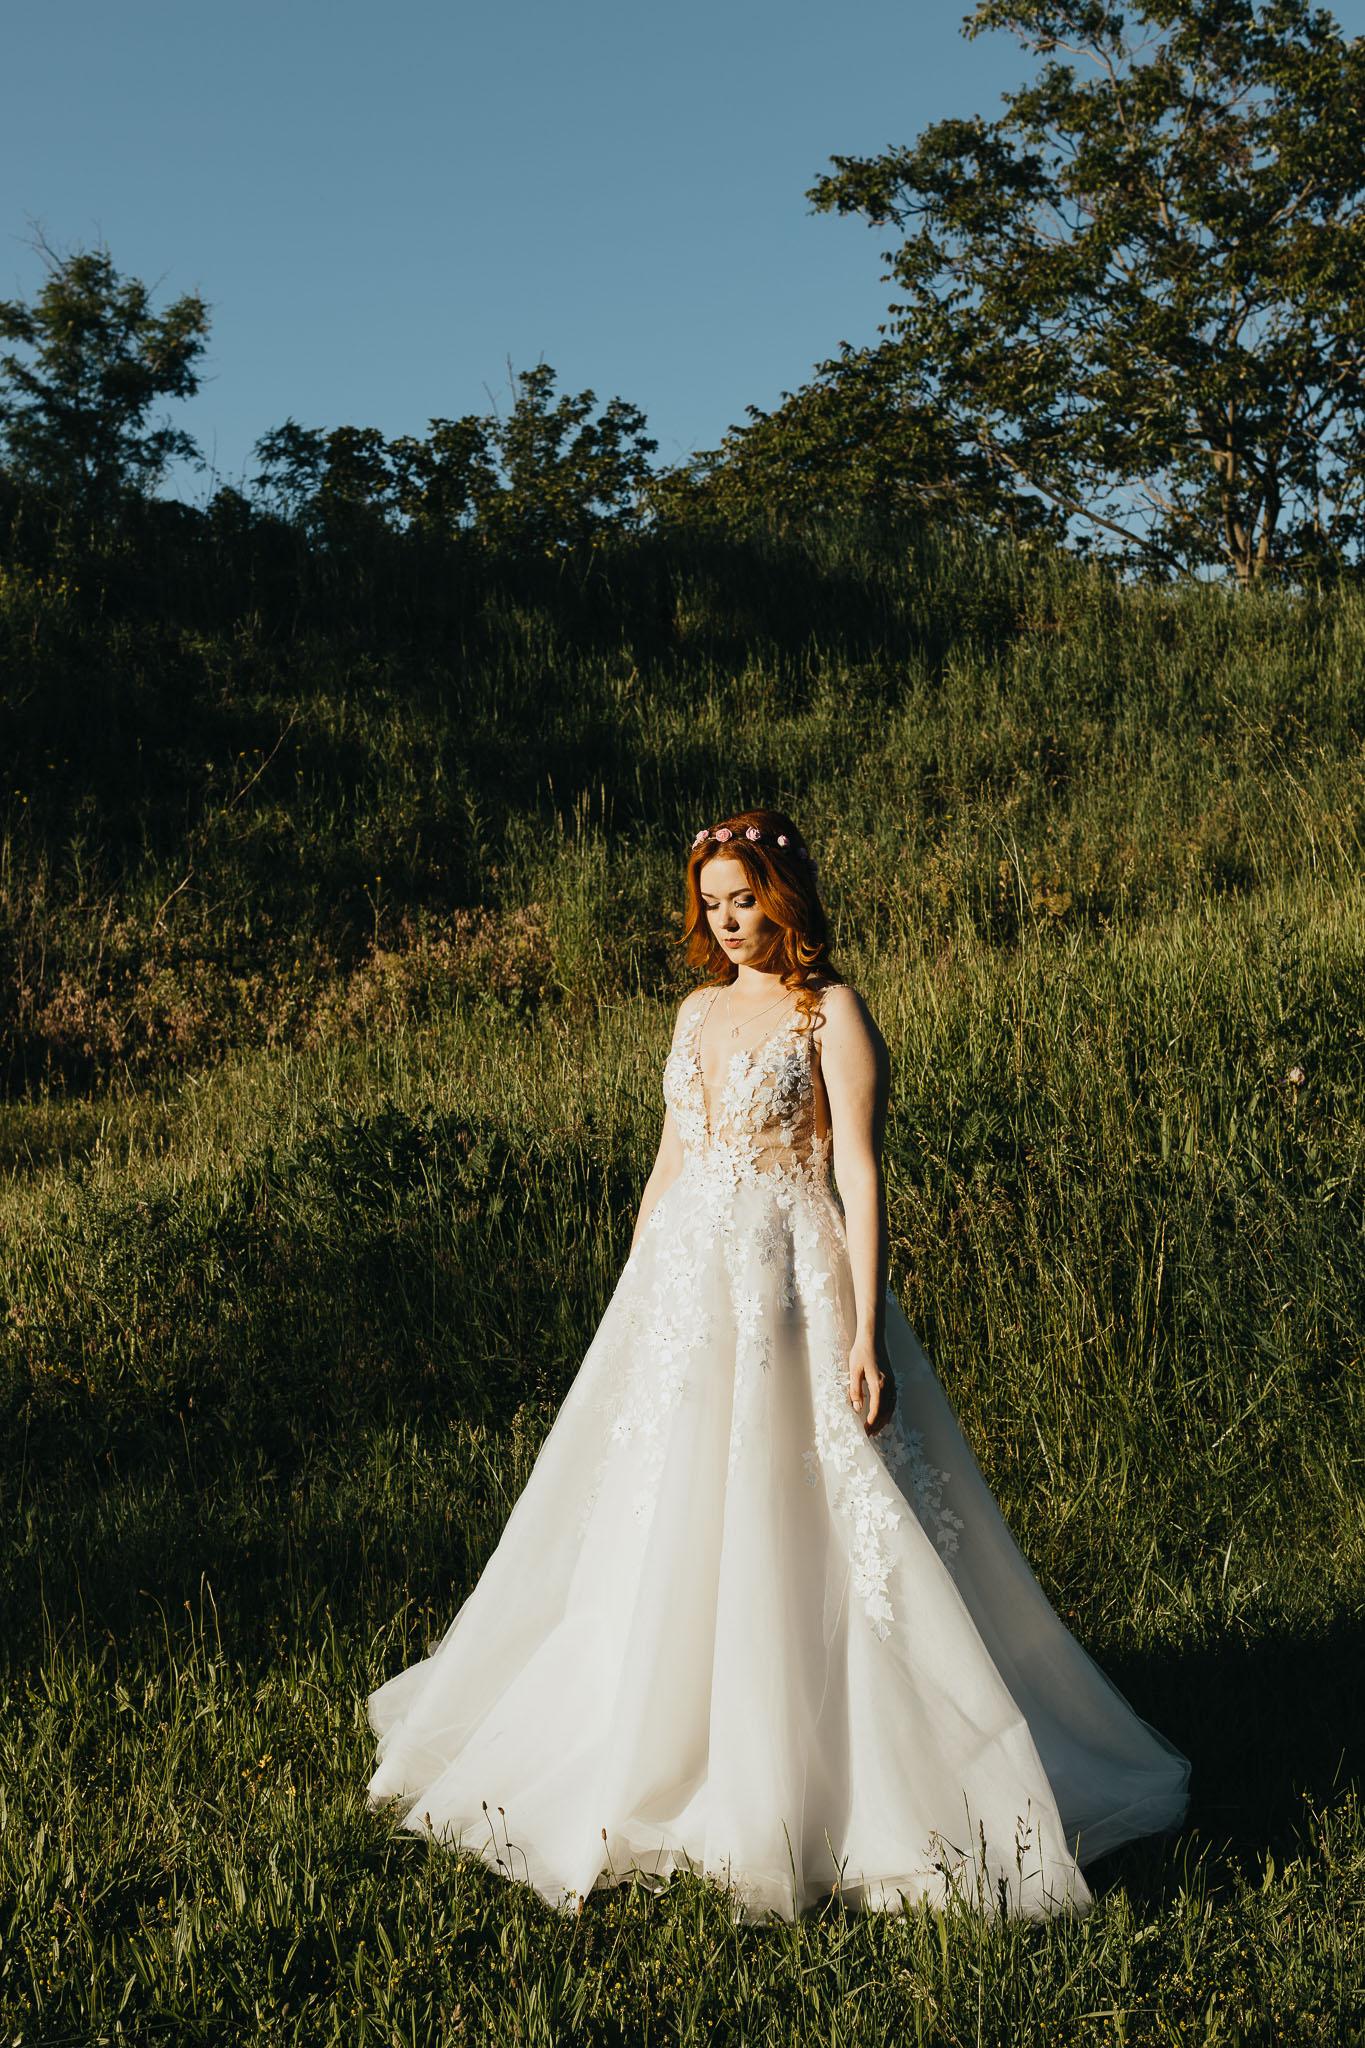 kubousfoto_svatebni_fotograf_brno_wedding